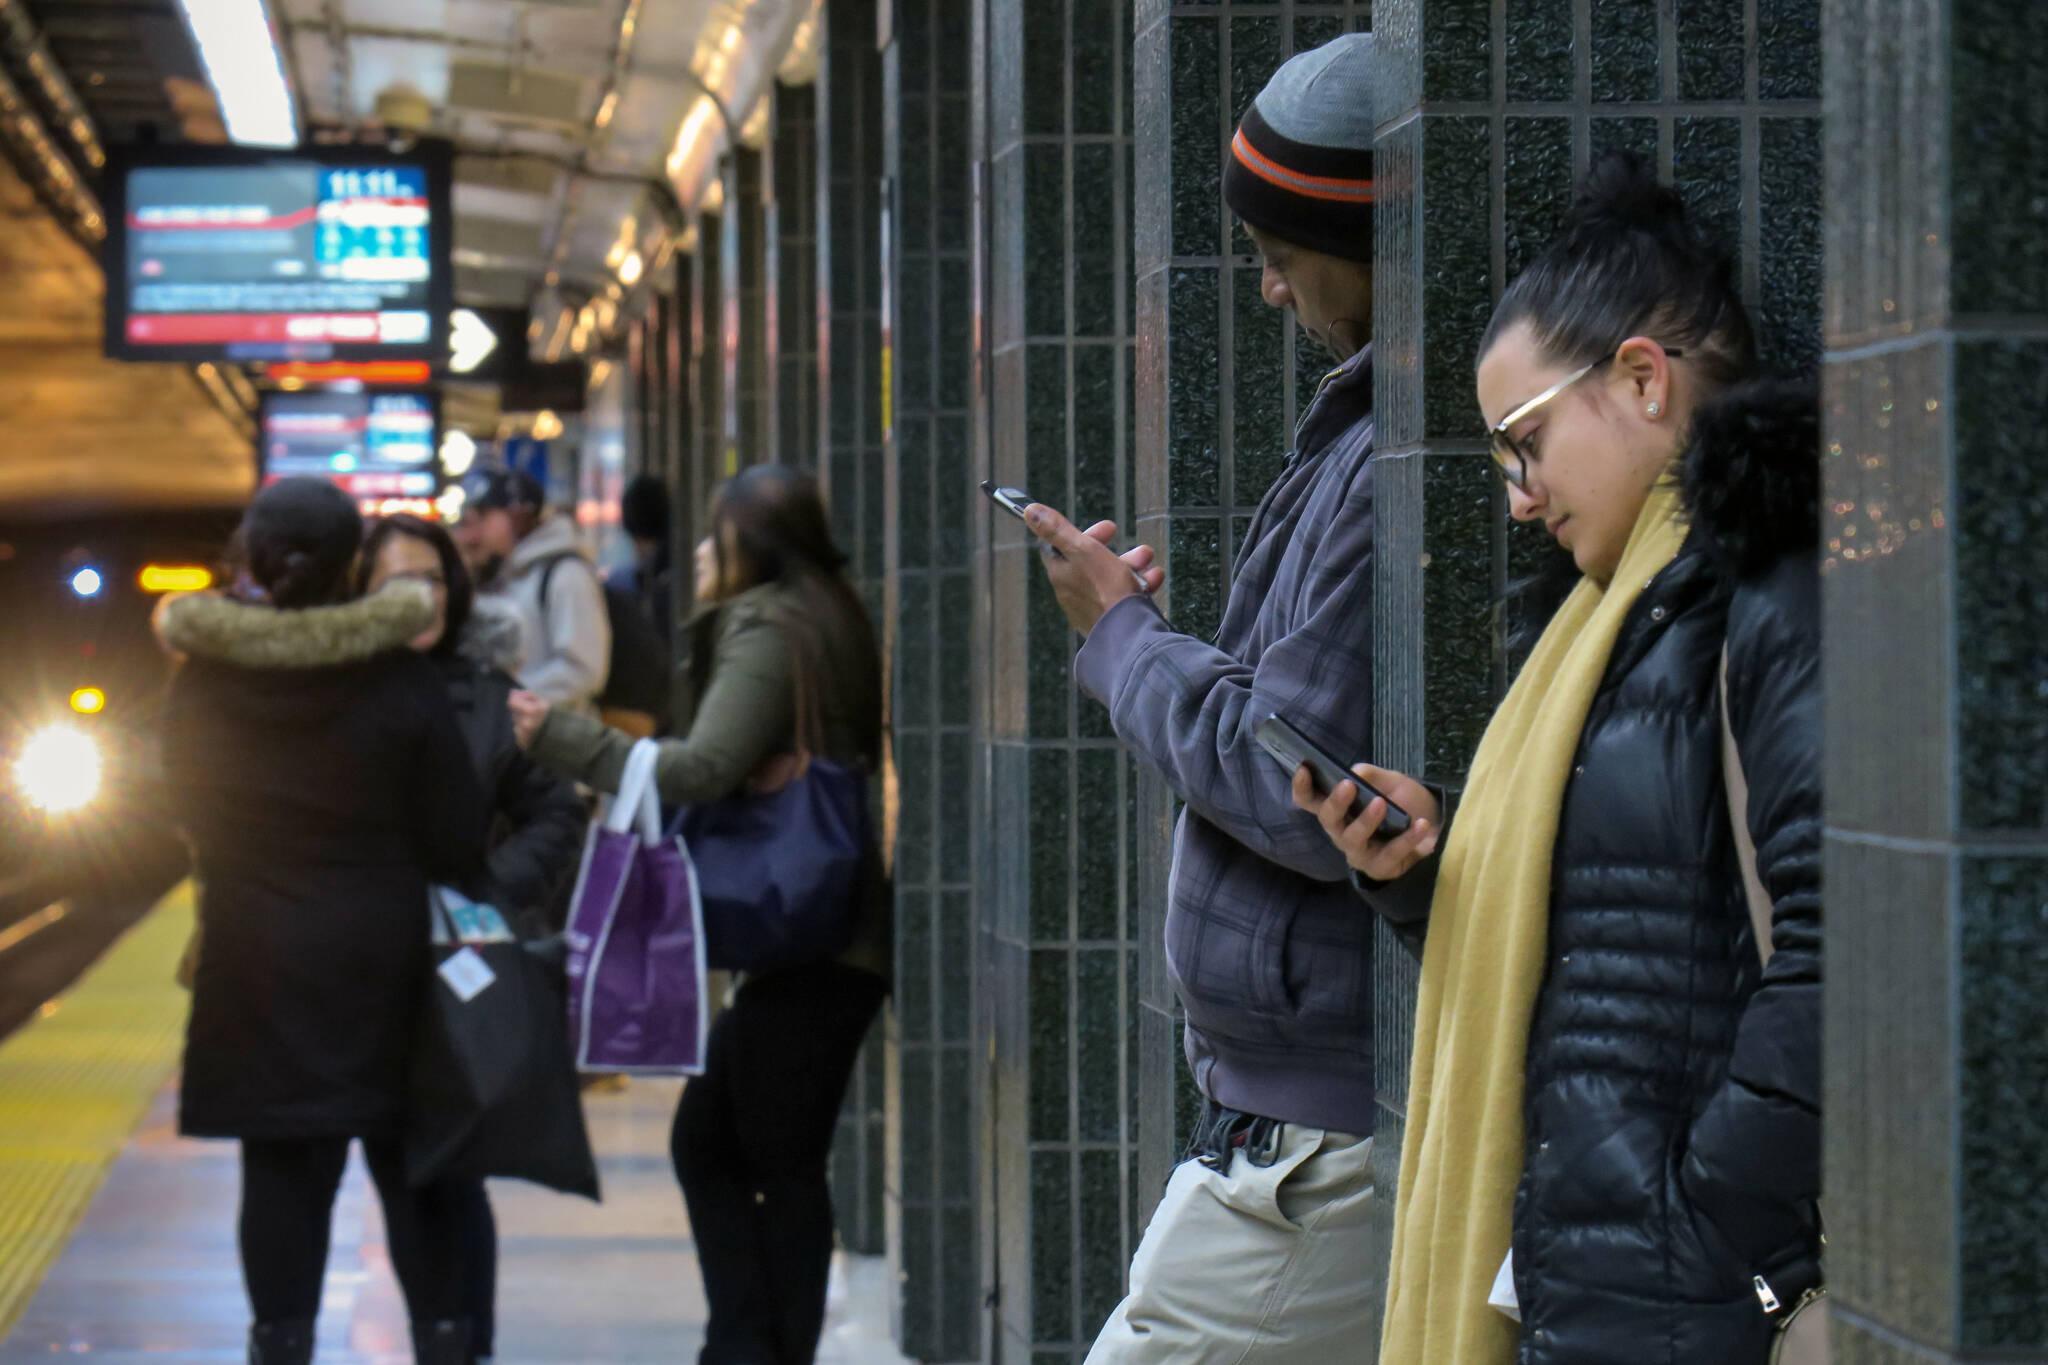 TTC cellphone service